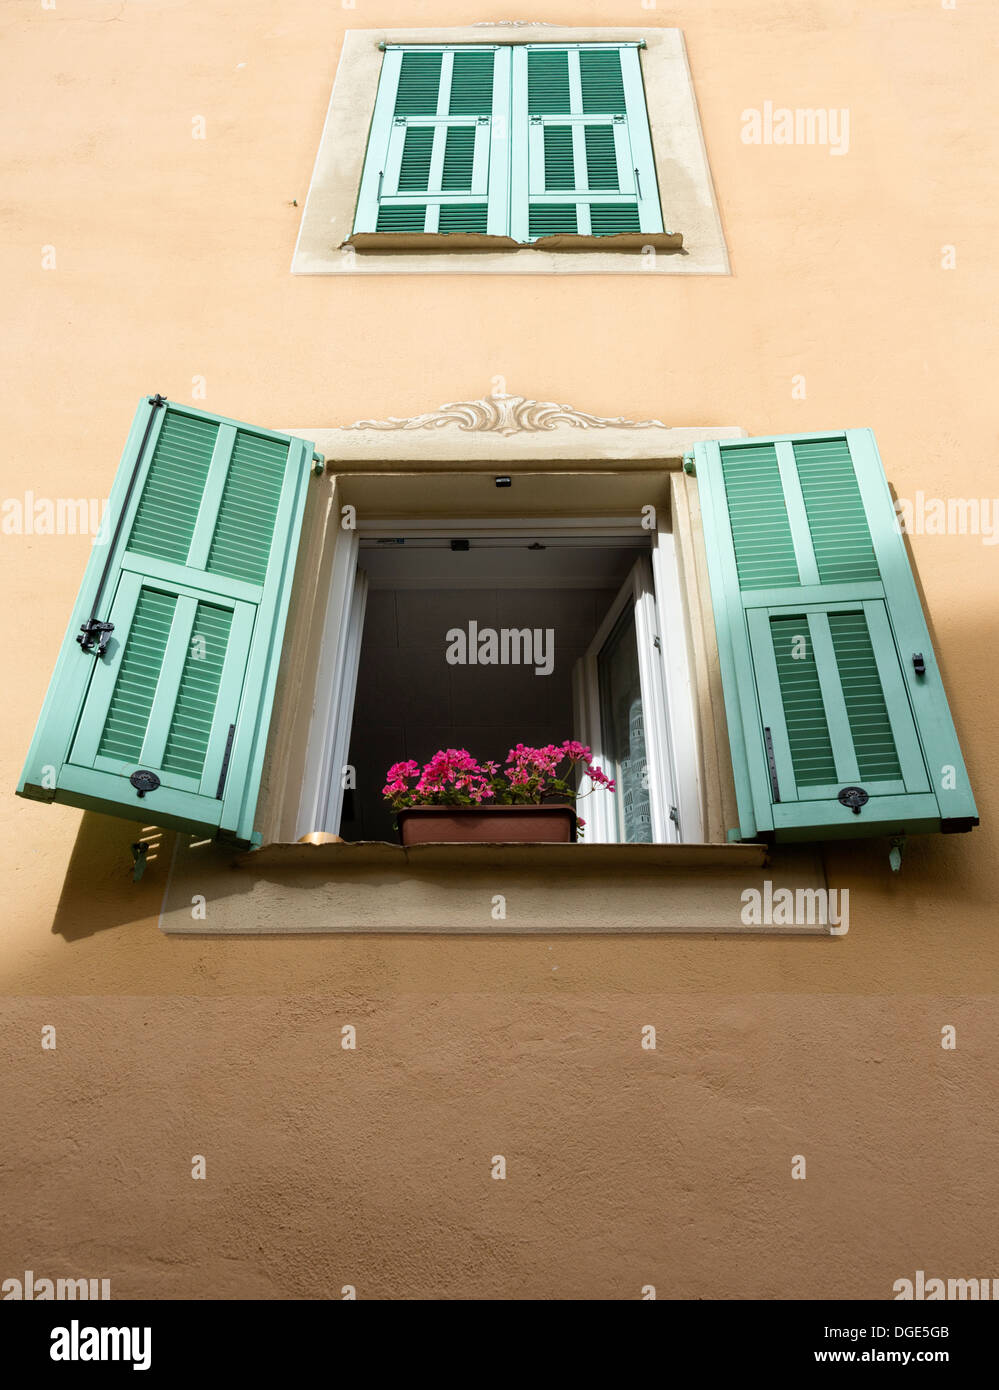 Shuttered windows in Place St Nicolas in Monaco - Stock Image